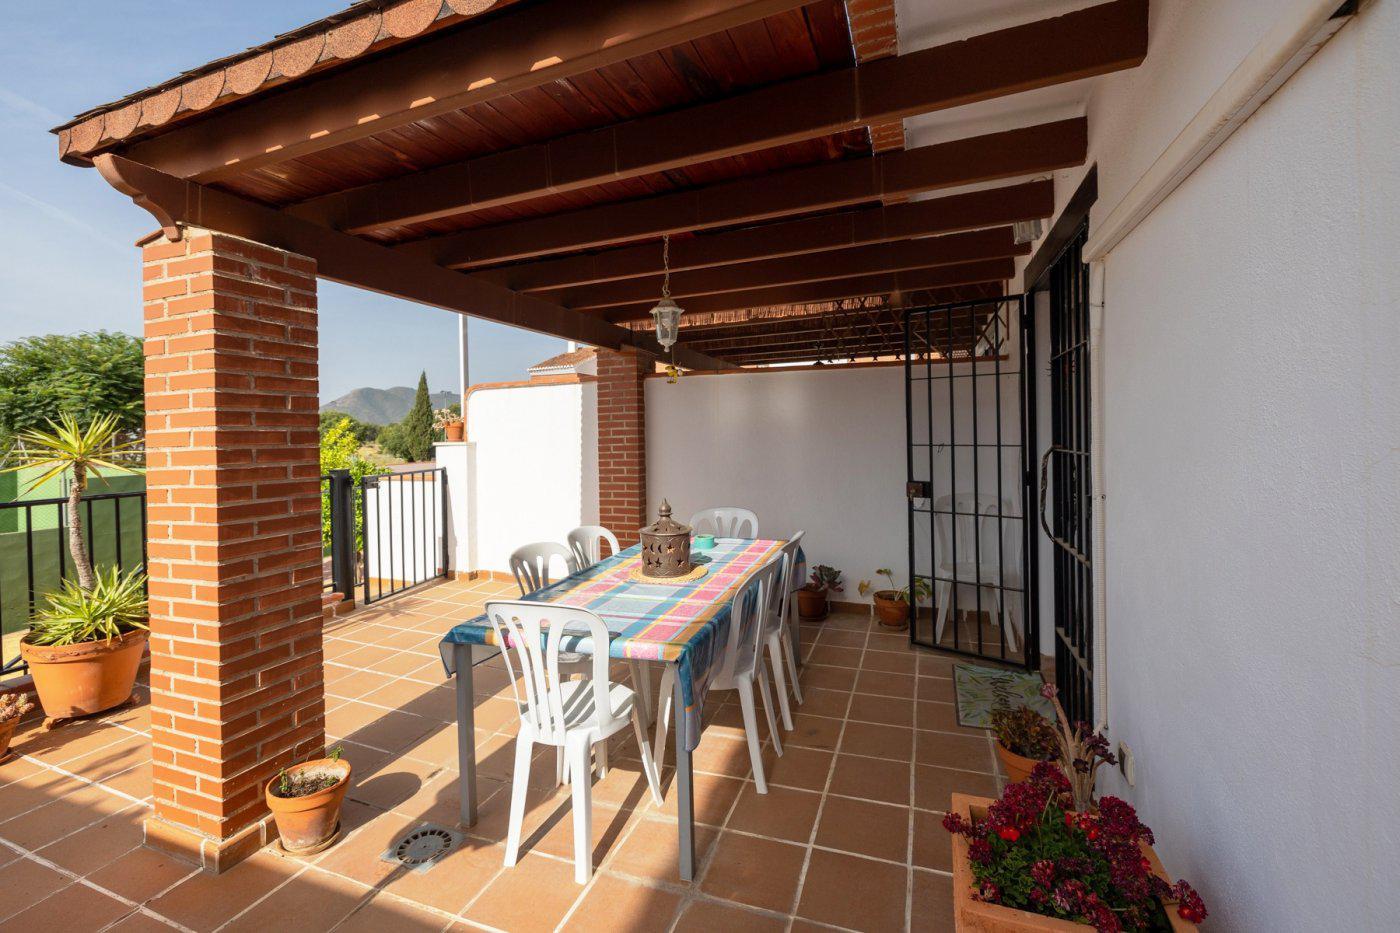 Imagen 3 Casa Adosada en venta en Atarfe / Urbanización Llanos de Silva-Pantano de Cubillas